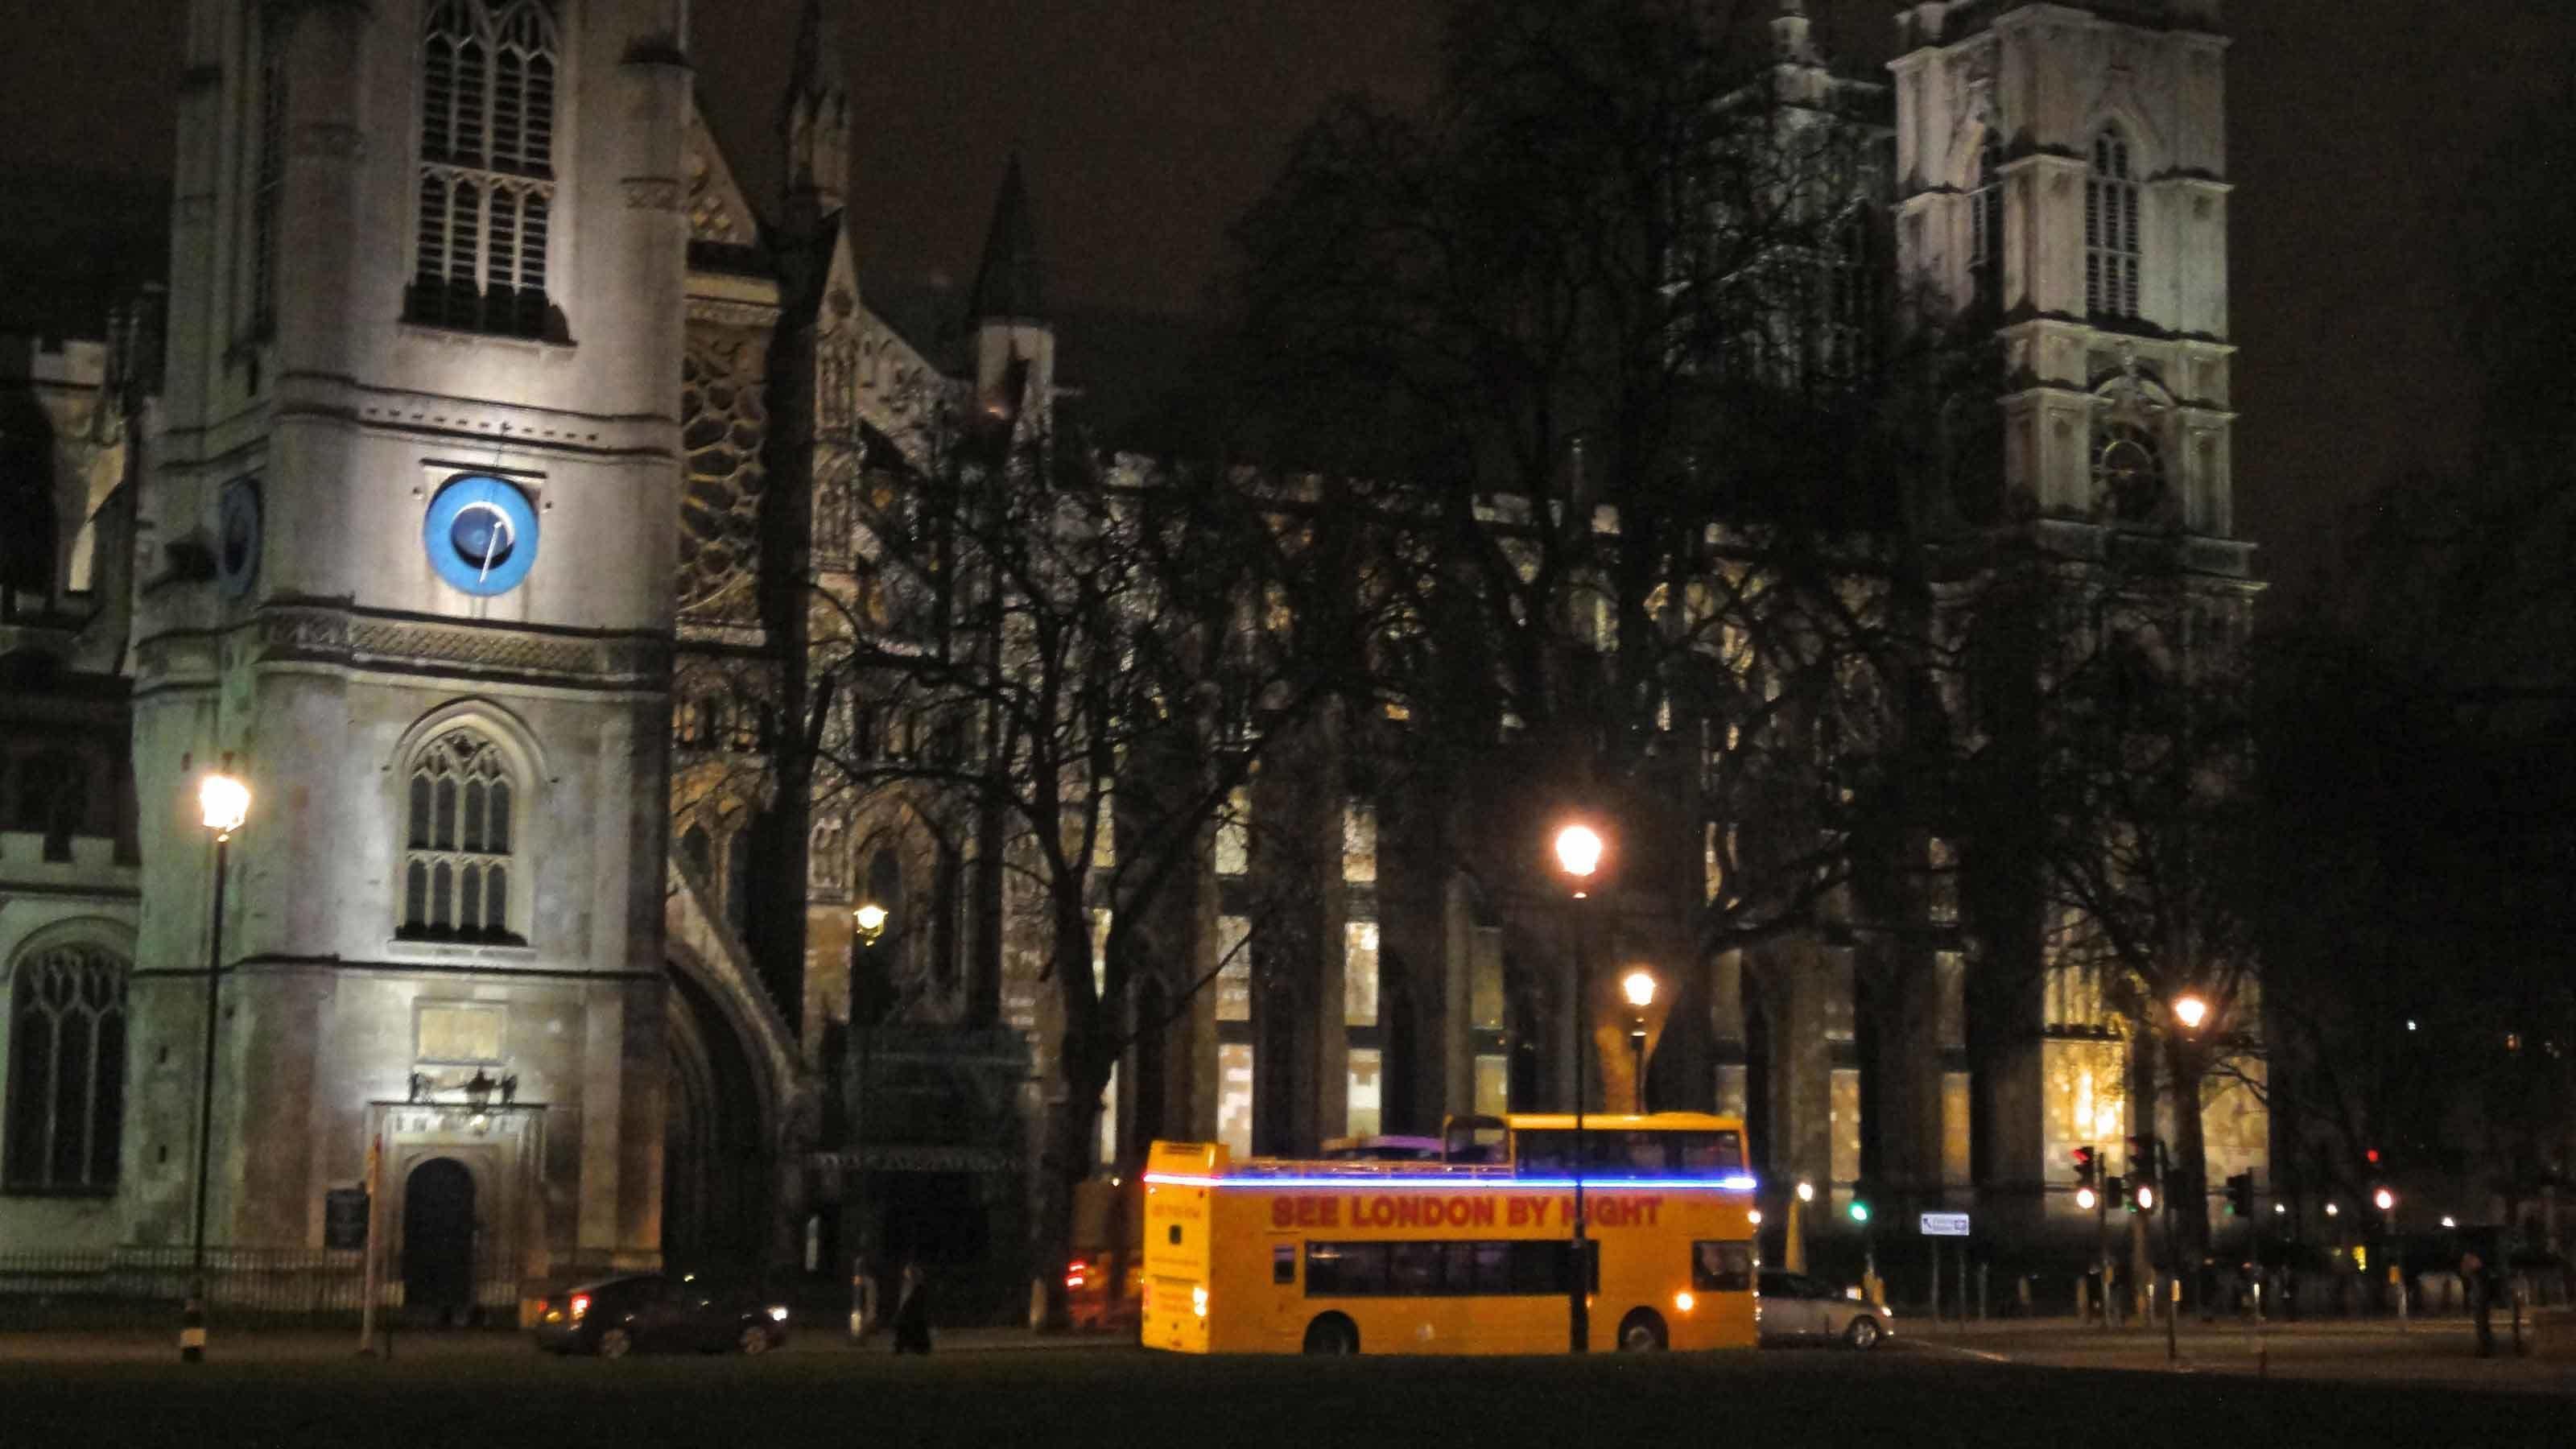 Yellow tour bus in London